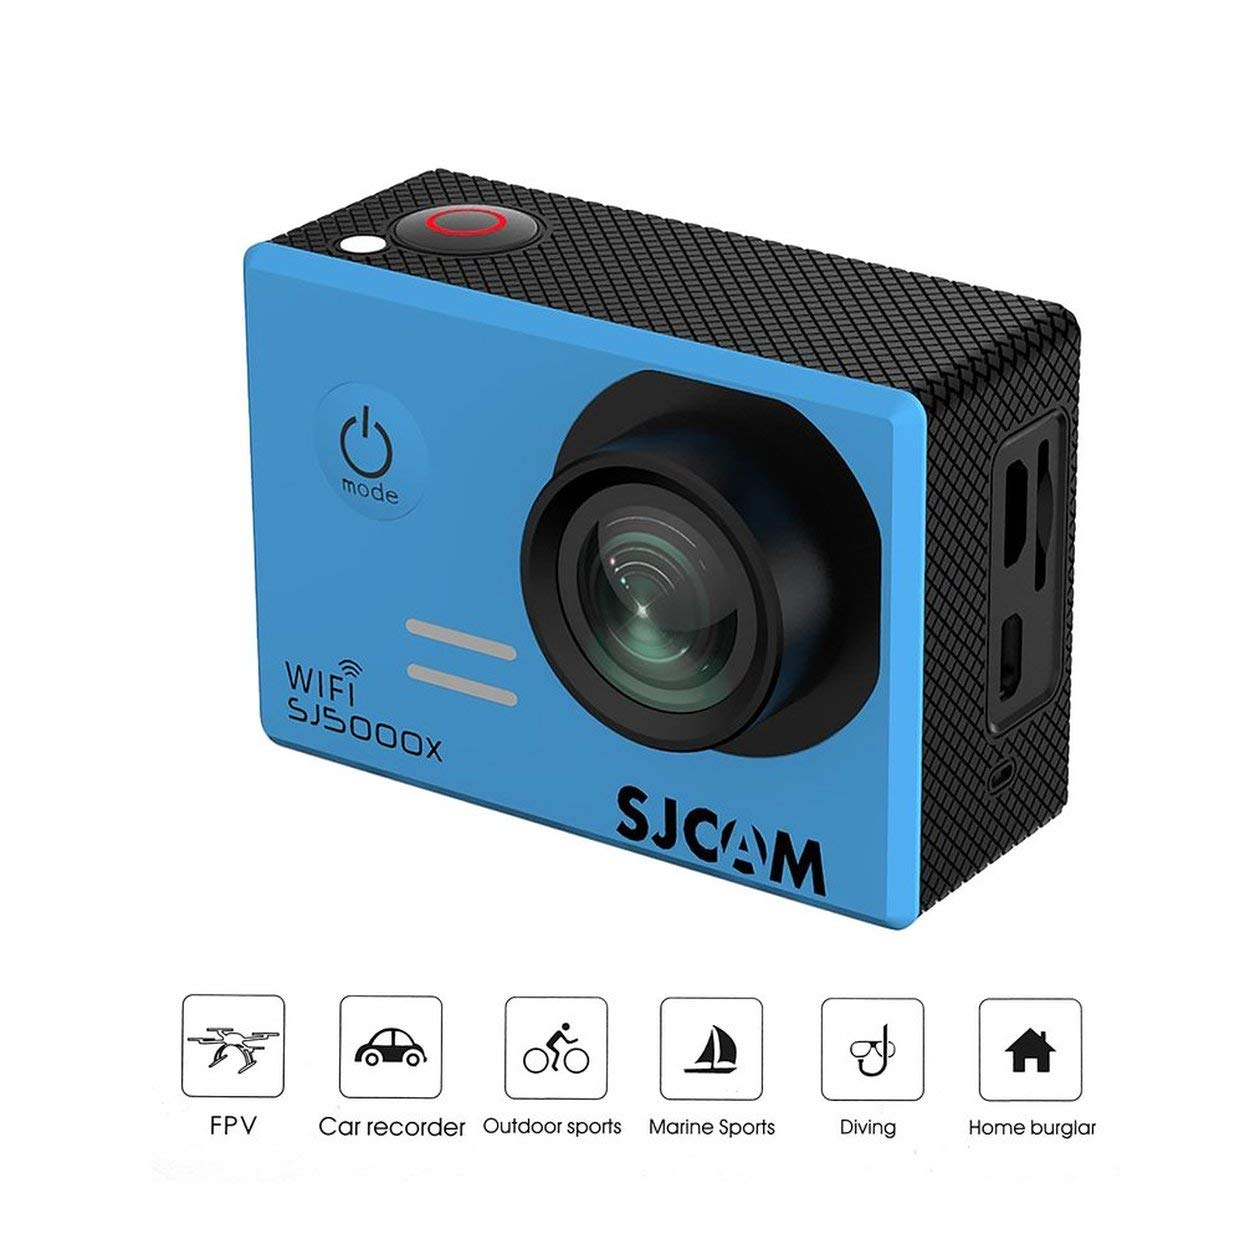 Saikogoods アクションカメラ 4K高画質 屋外用SJCAM SJ5000Xアクションスポーツカメラエリート水中ビデオカメラ30メートル防水カメラウルトラHD 4K 黒 B07KRJLGY3 青 青